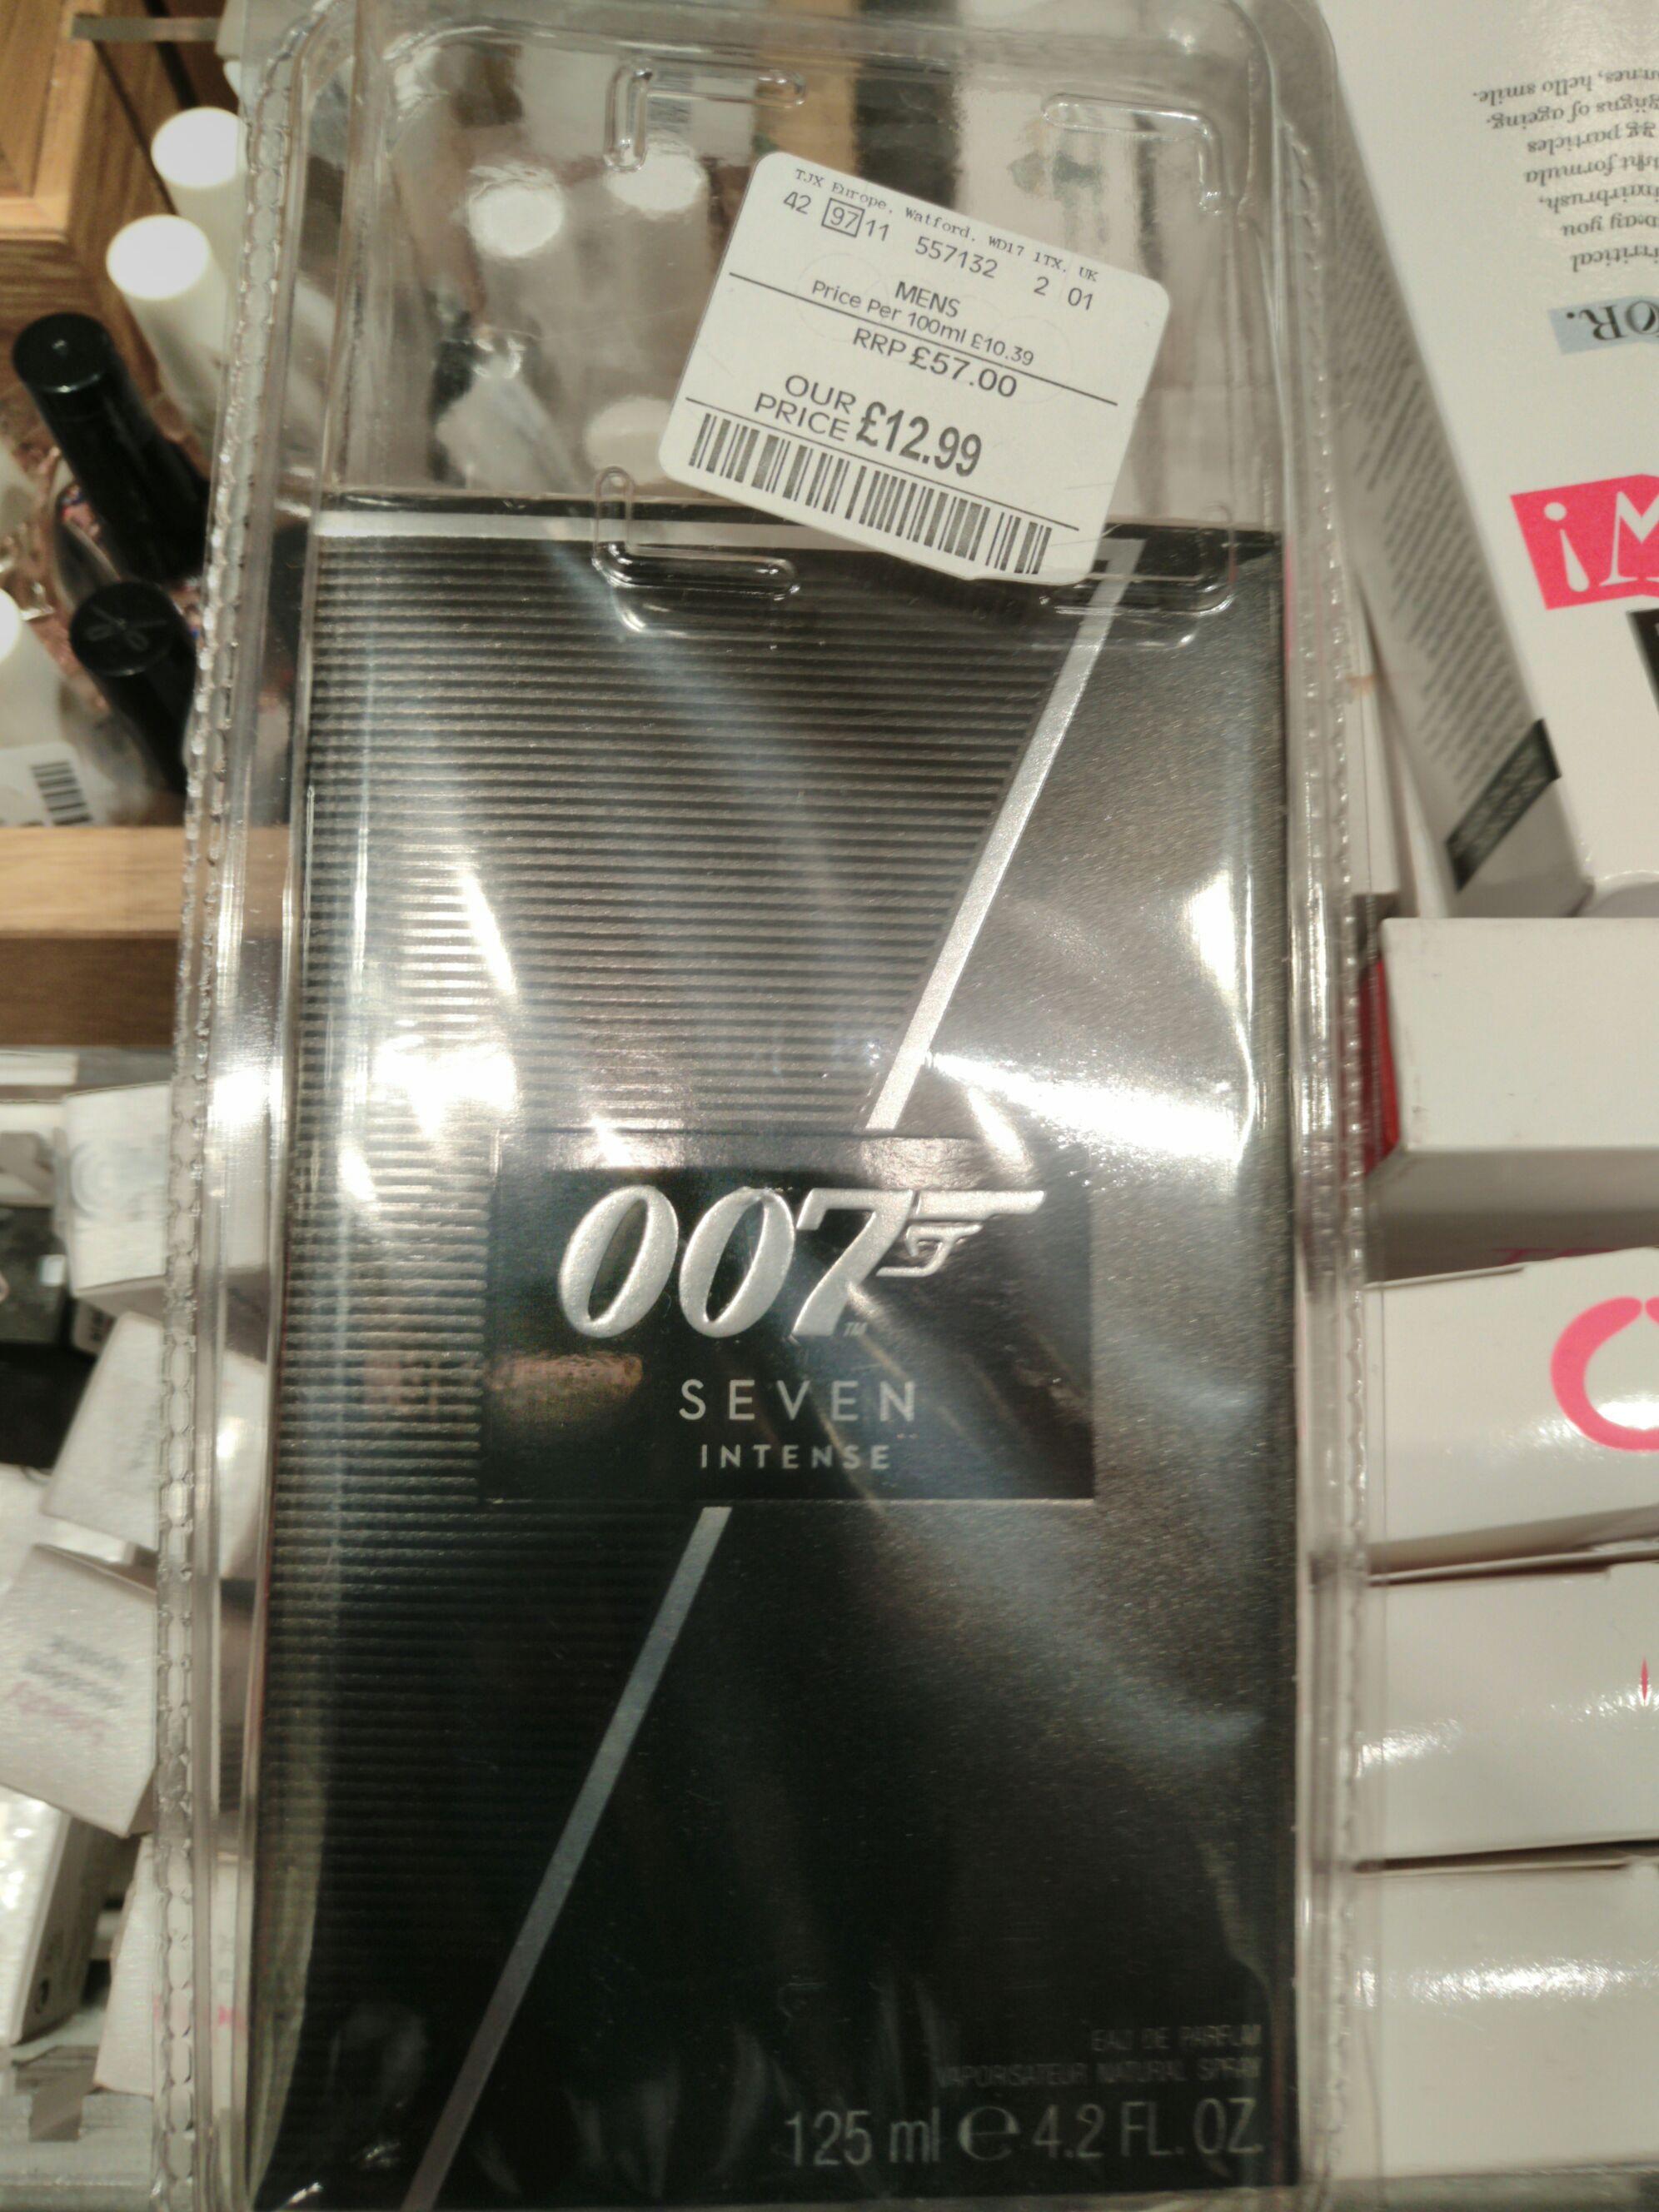 007 Seven Intense TKmaxx in store 125ml Mens EDP 12.99